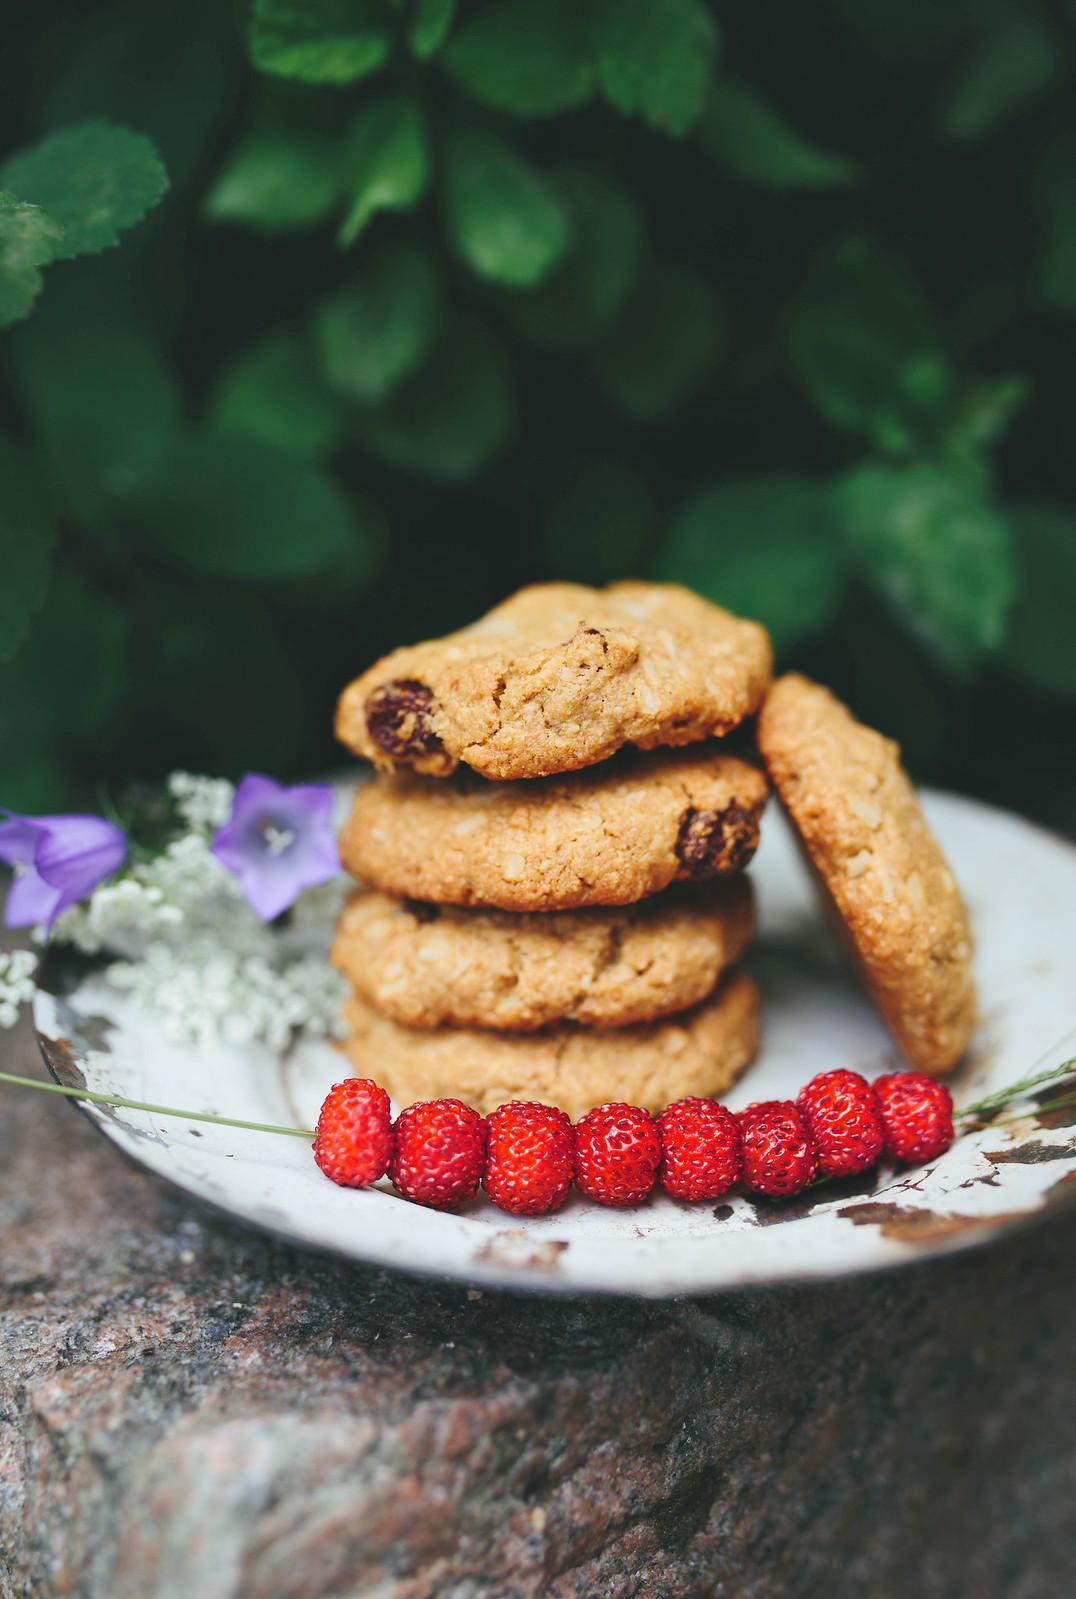 Glutenfria Havrekakor / Gluten free Oat Cookies